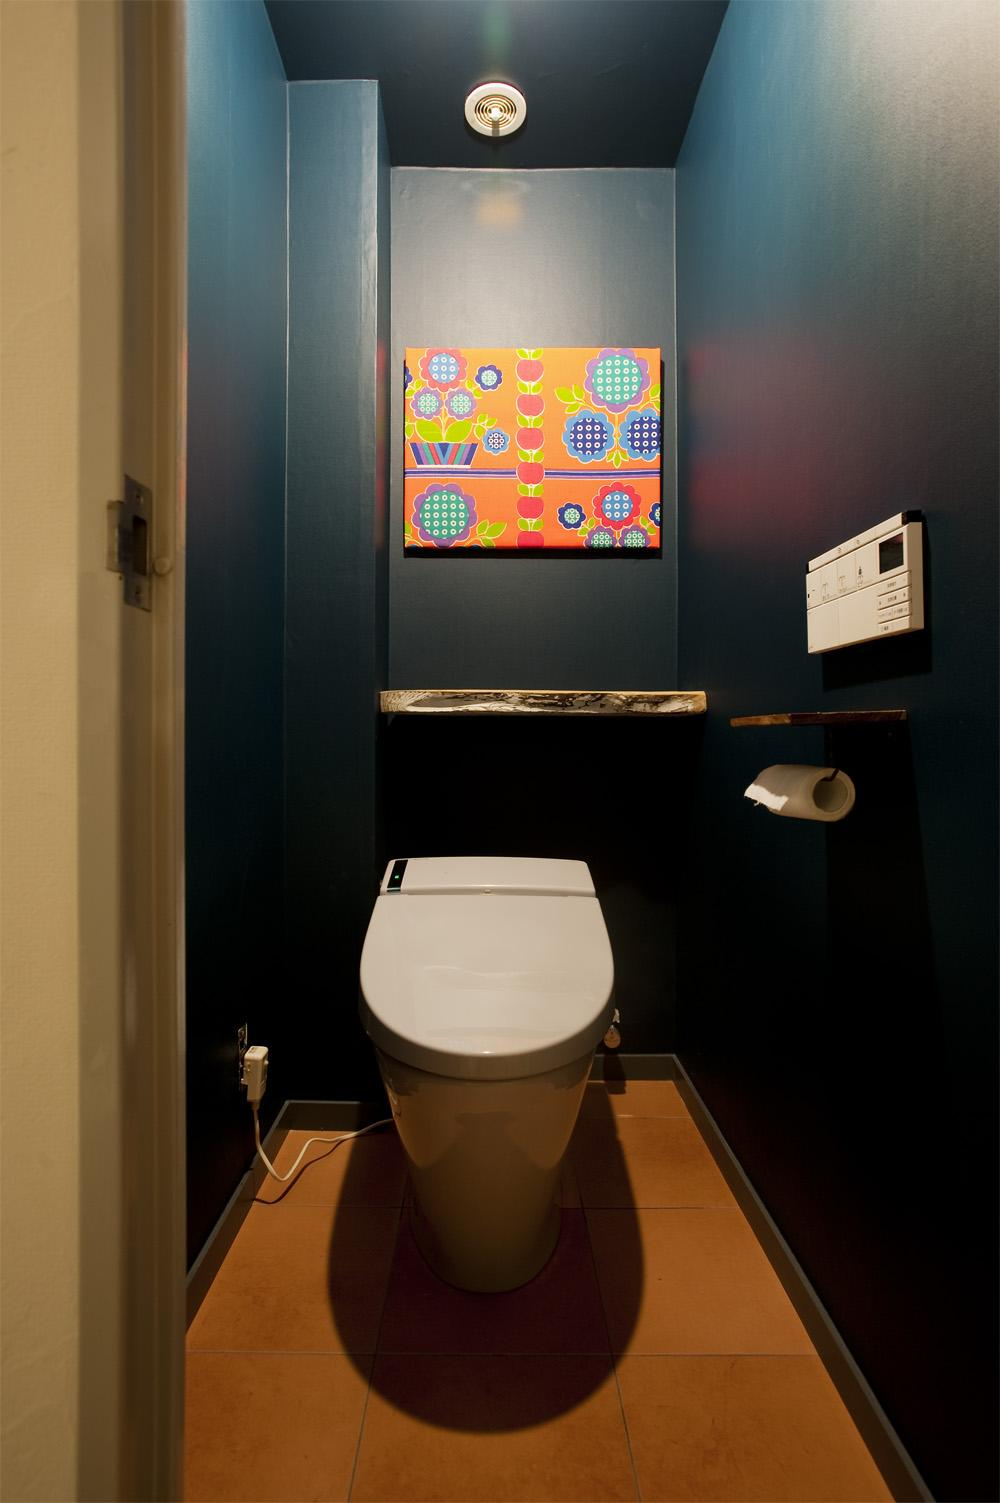 H邸・ハンモックのゆれる、光と風のリビングの部屋 深いブルーの壁のトイレ